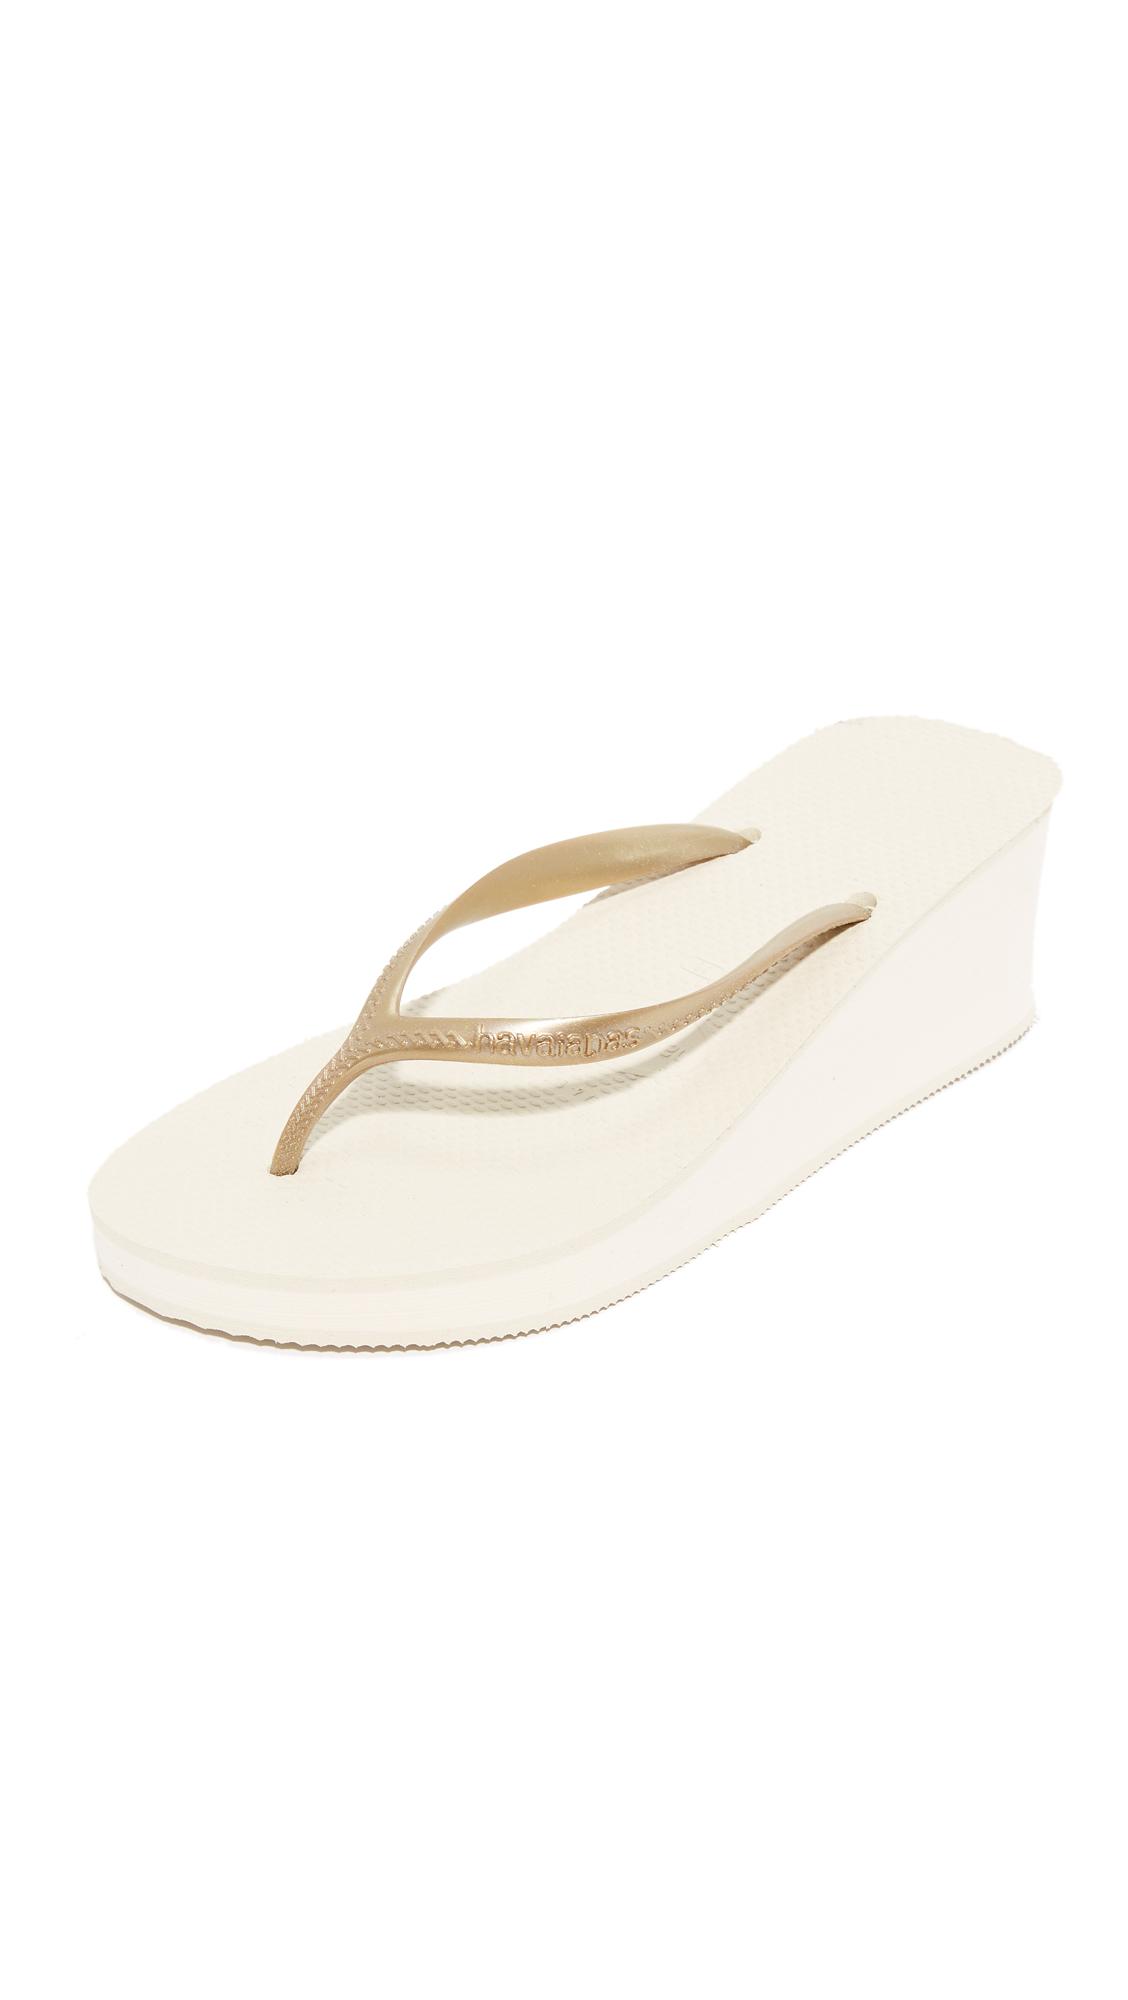 Havaianas High Fashion Wedge Sandals - Beige at Shopbop